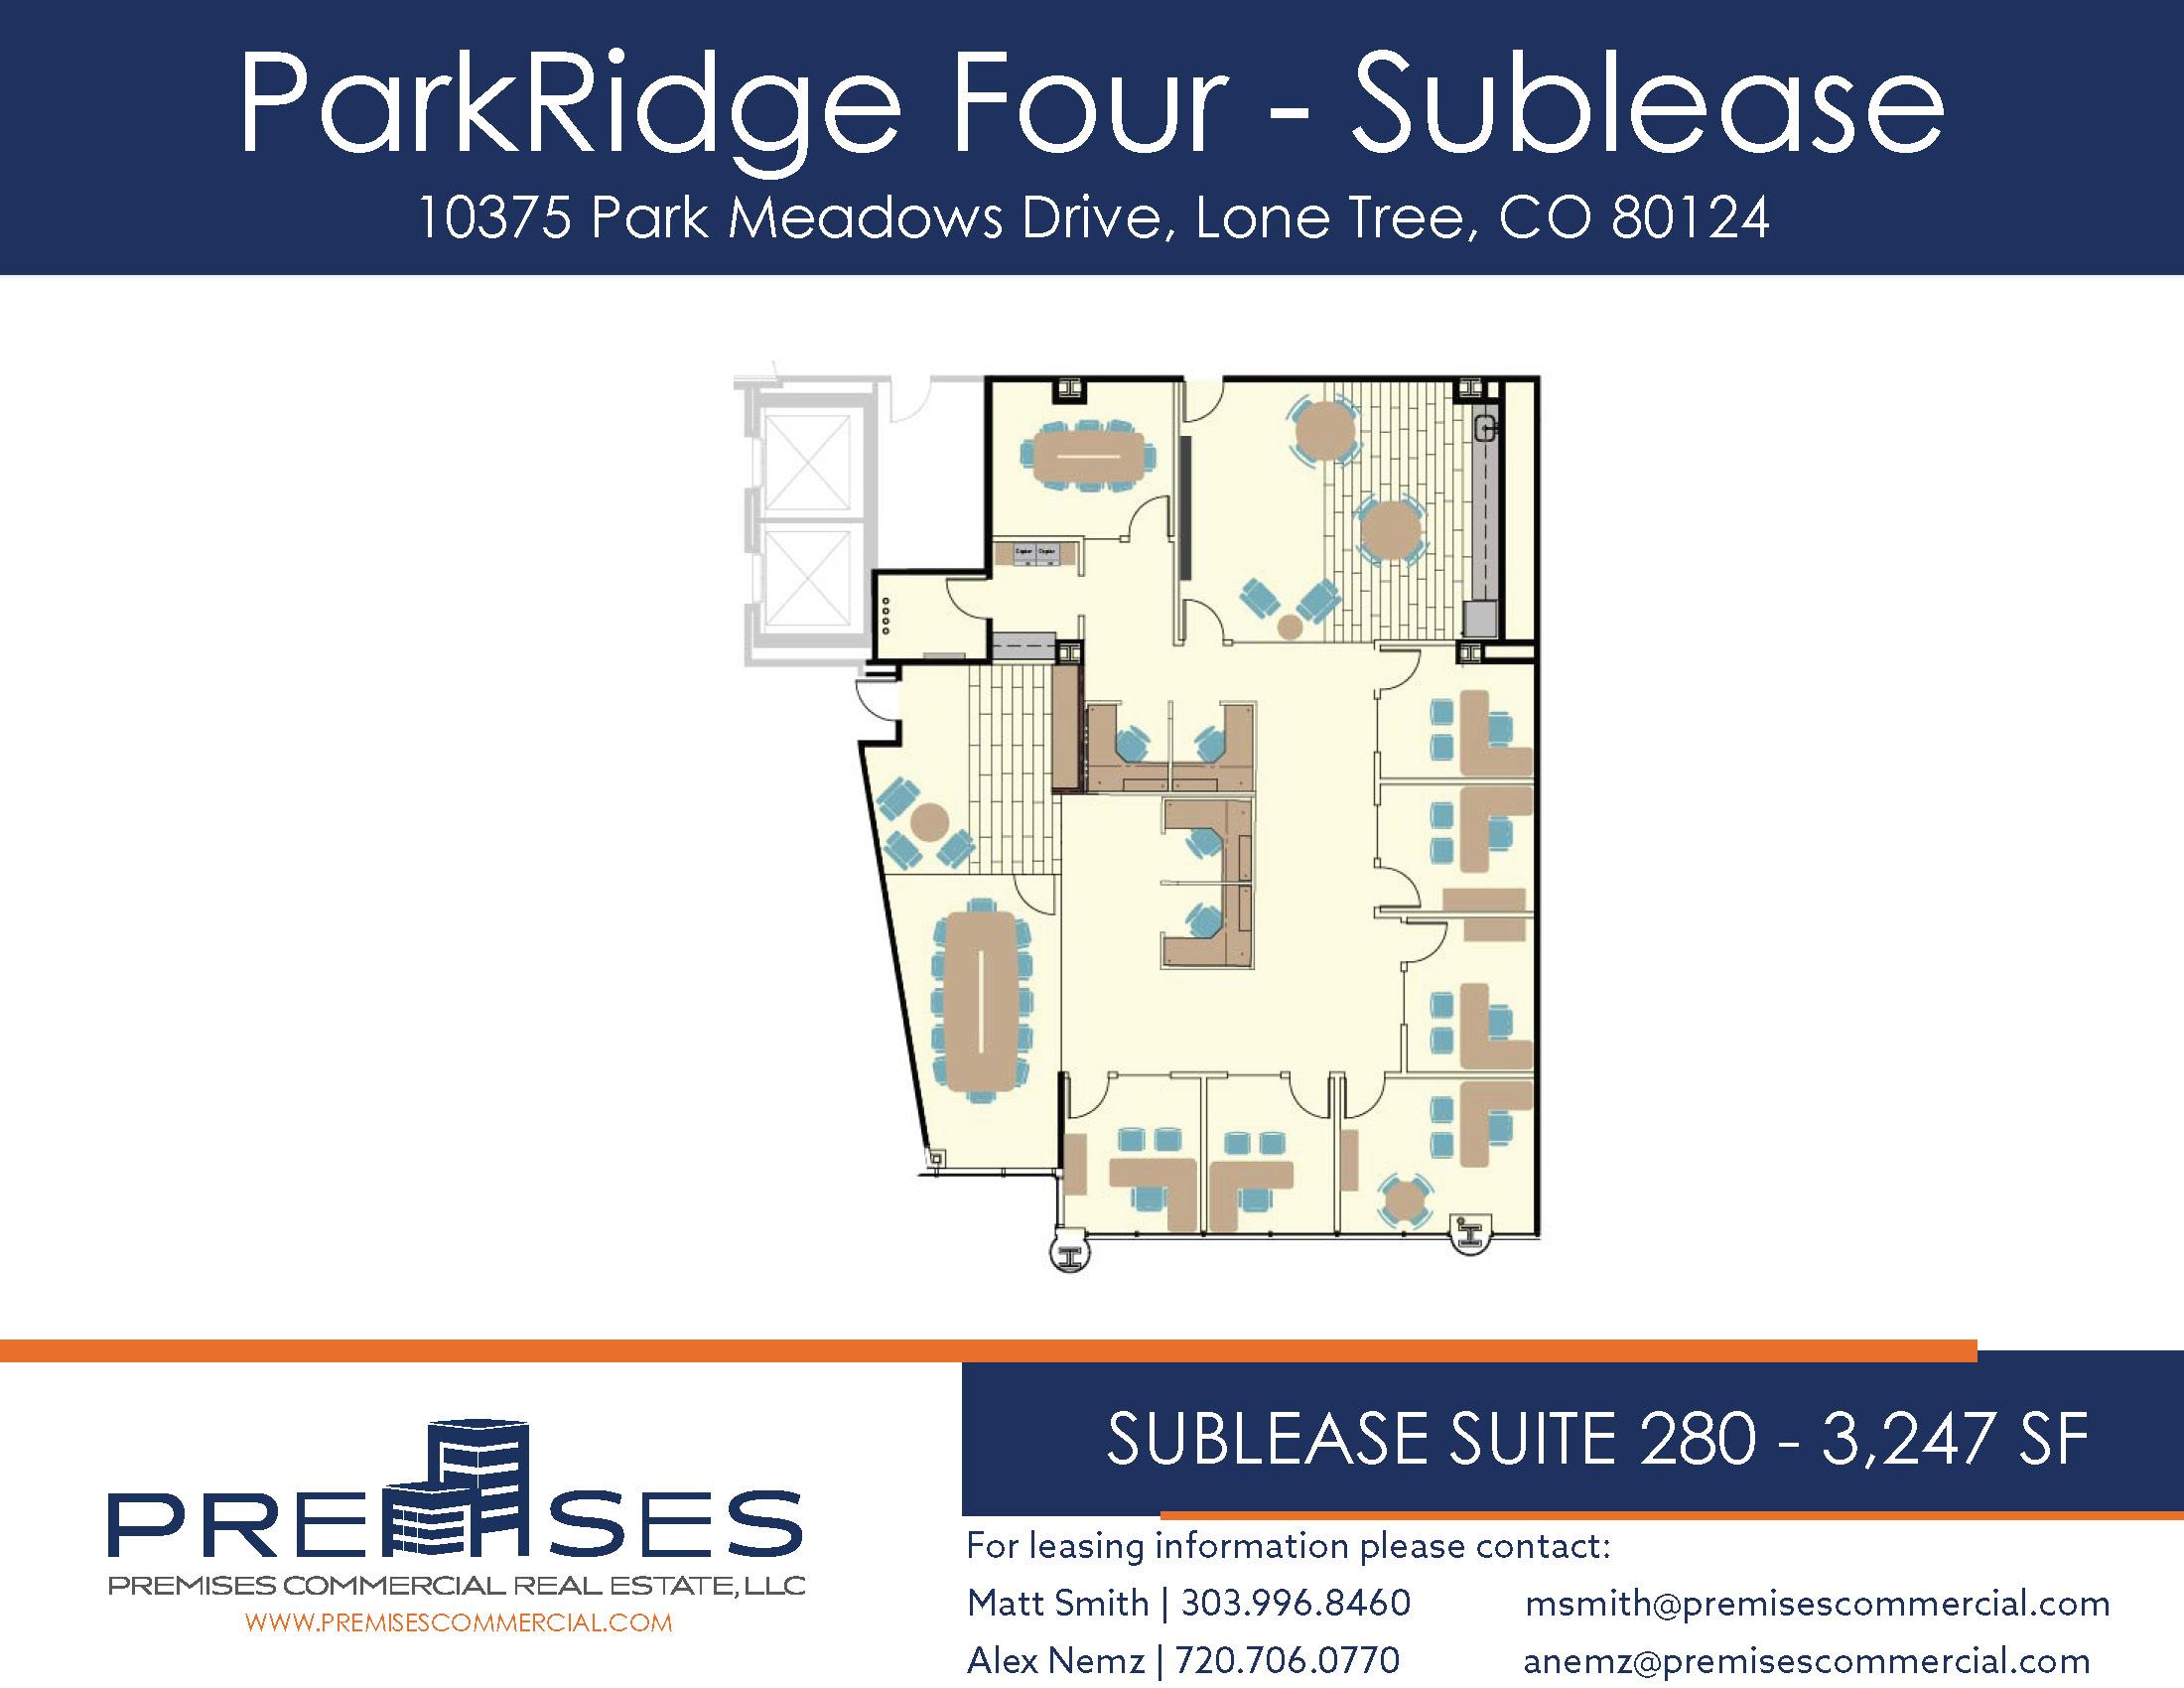 Sublease Suite 280 - 3,247 SF